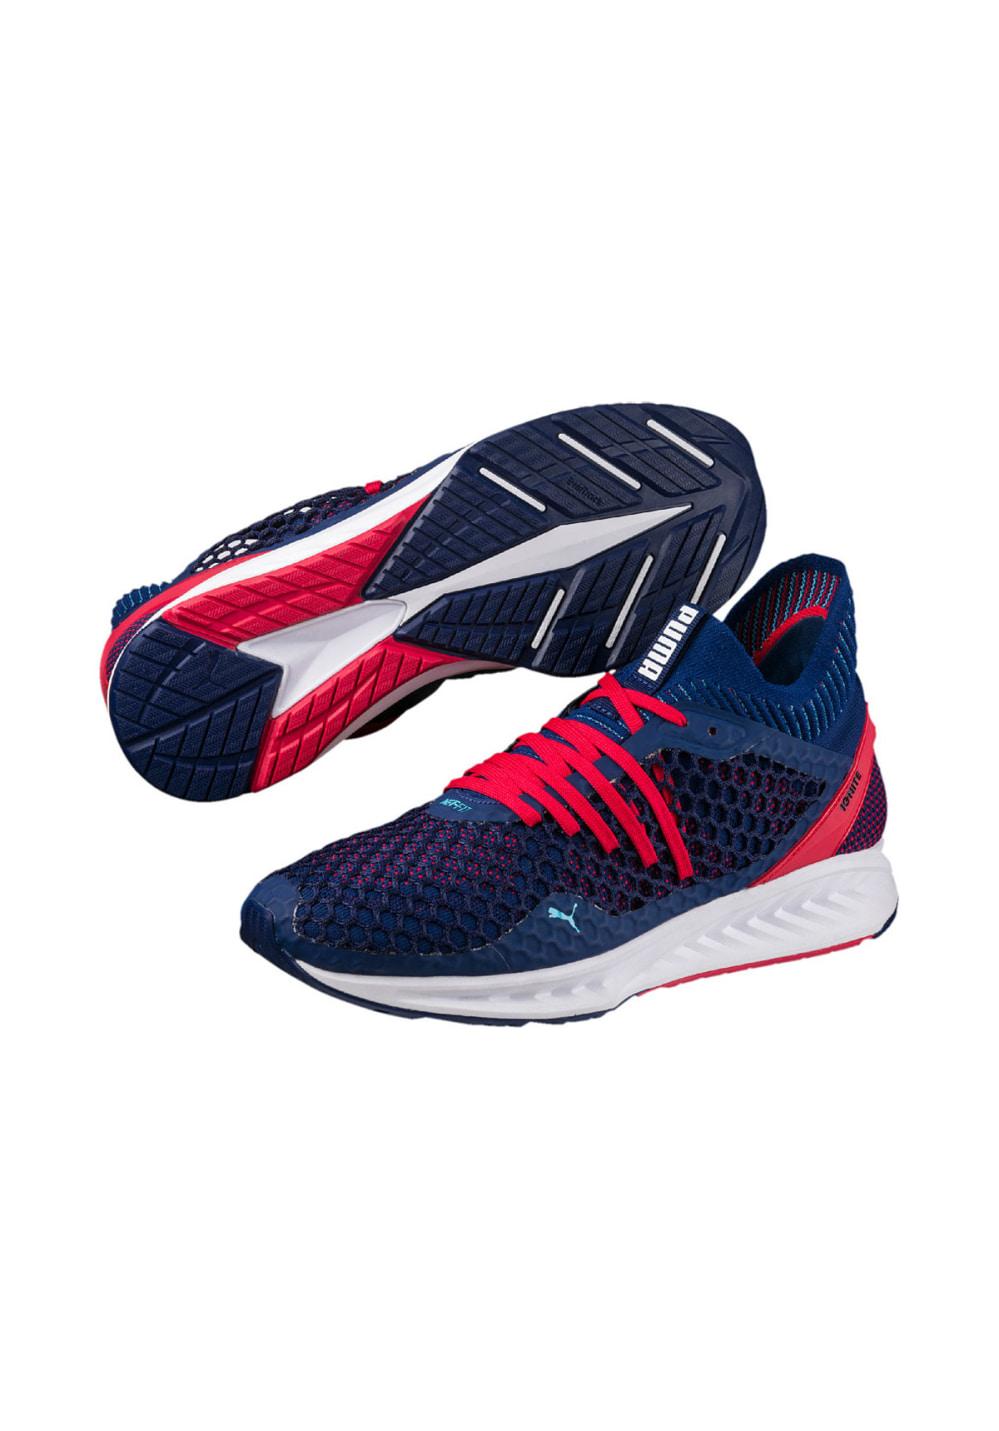 74390c61d20 Previous. Next. -60%. Puma. IGNITE NETFIT - Running shoes ...